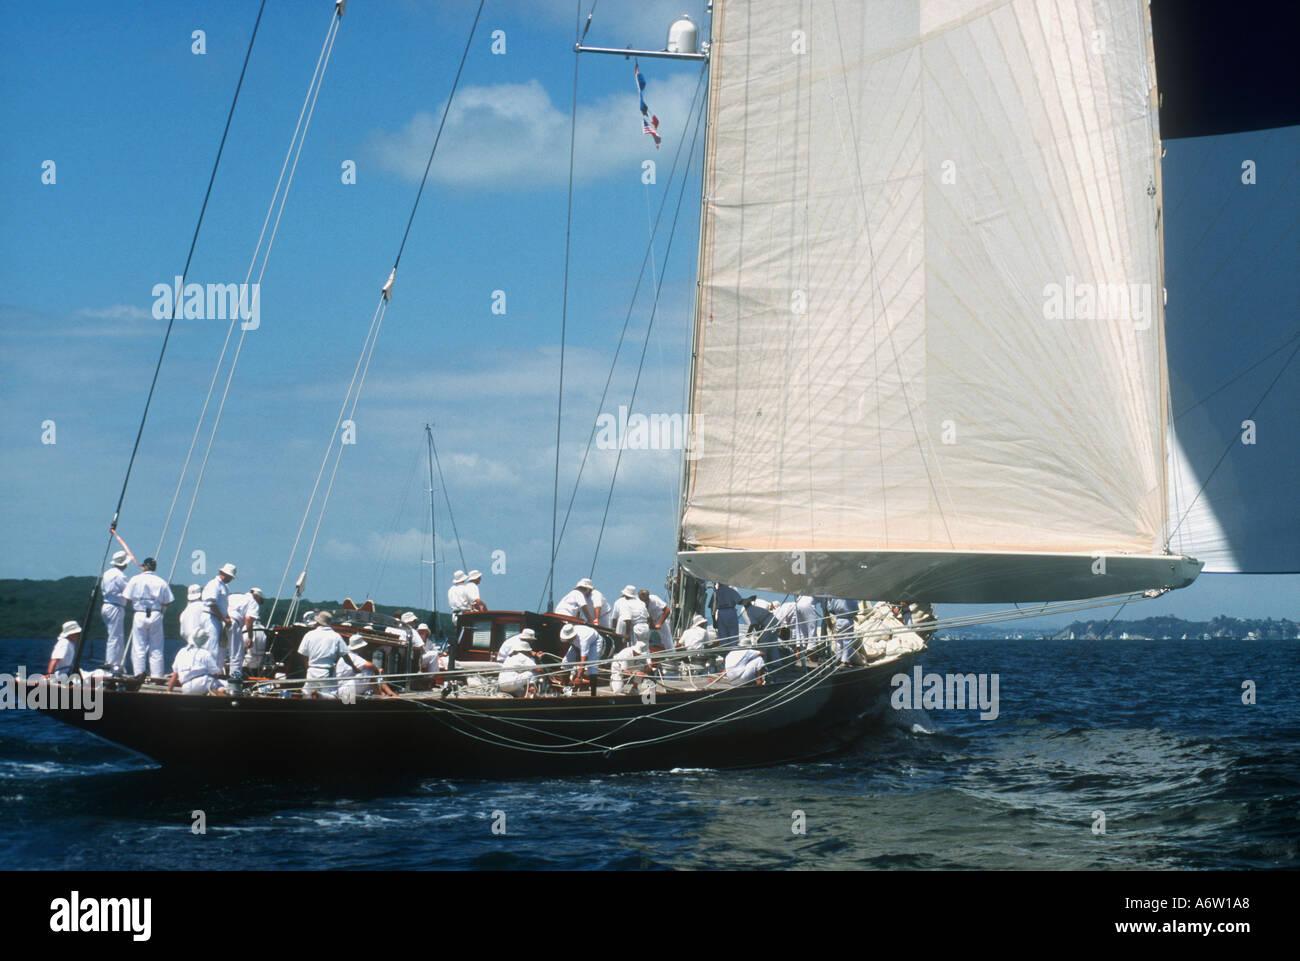 1933 Camper and Nicholson J Class Velsheda Logan Classic regatta 2000 Auckland New Zealand Stock Photo